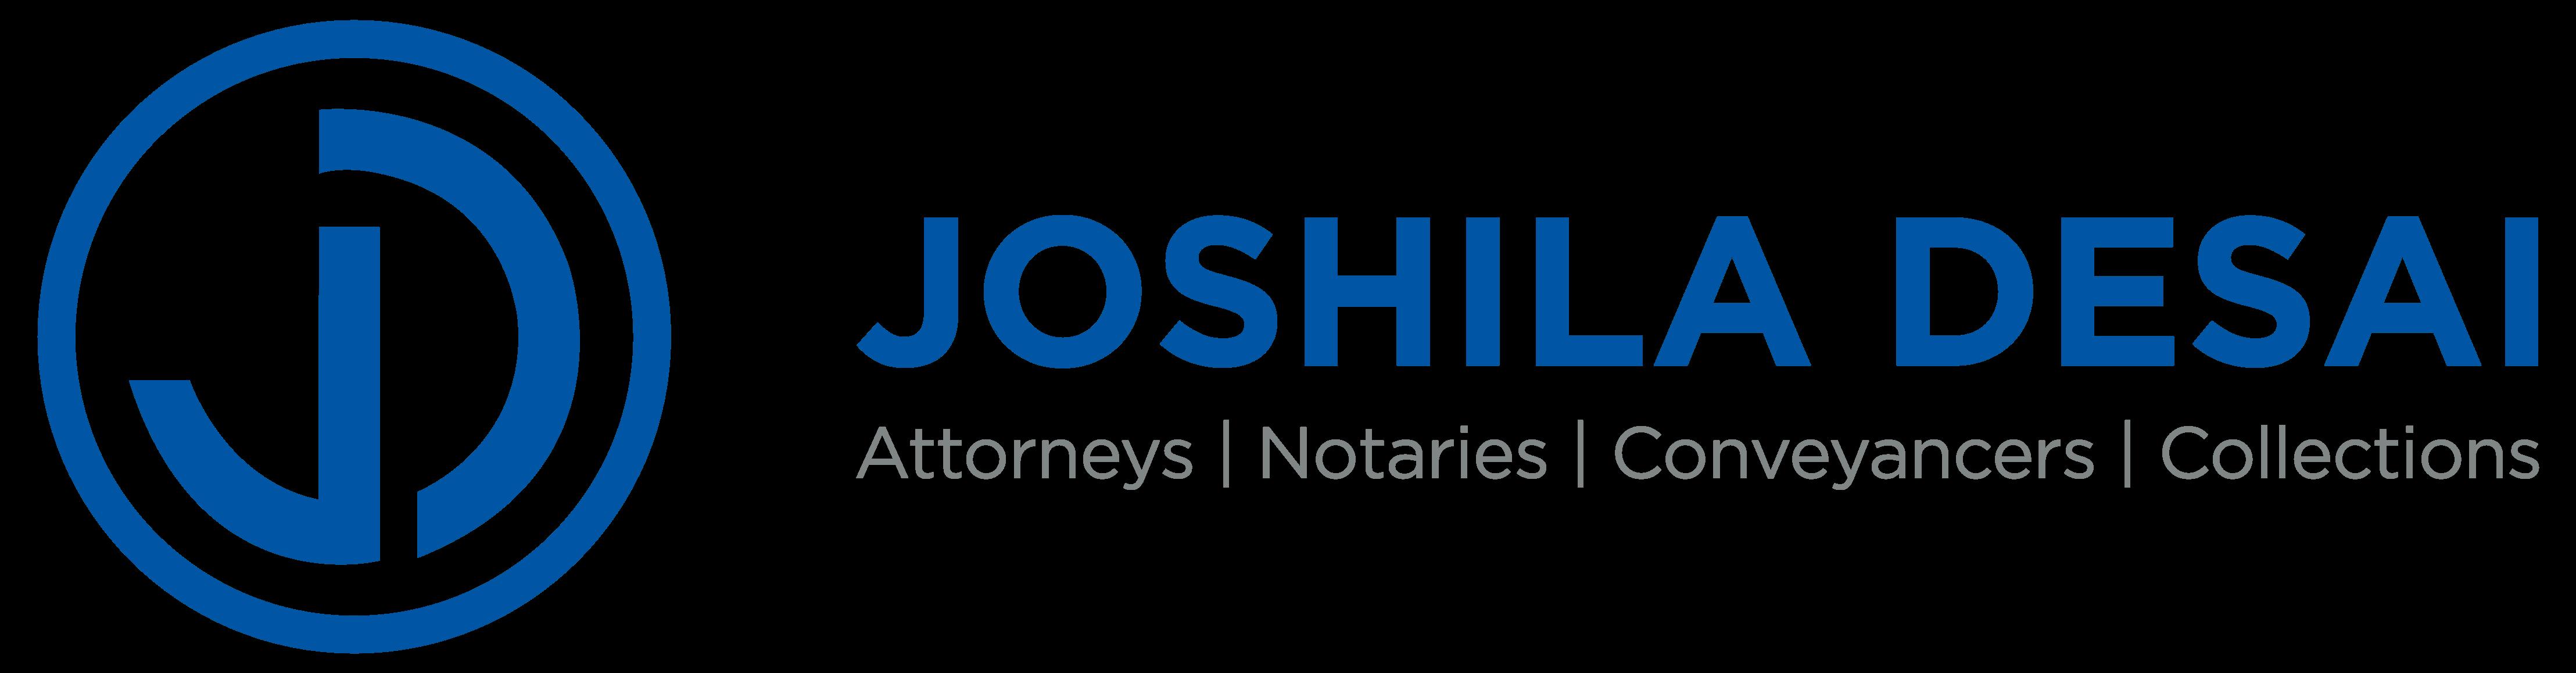 Joshila Desai   Attorneys   Notaries   Conveyancers